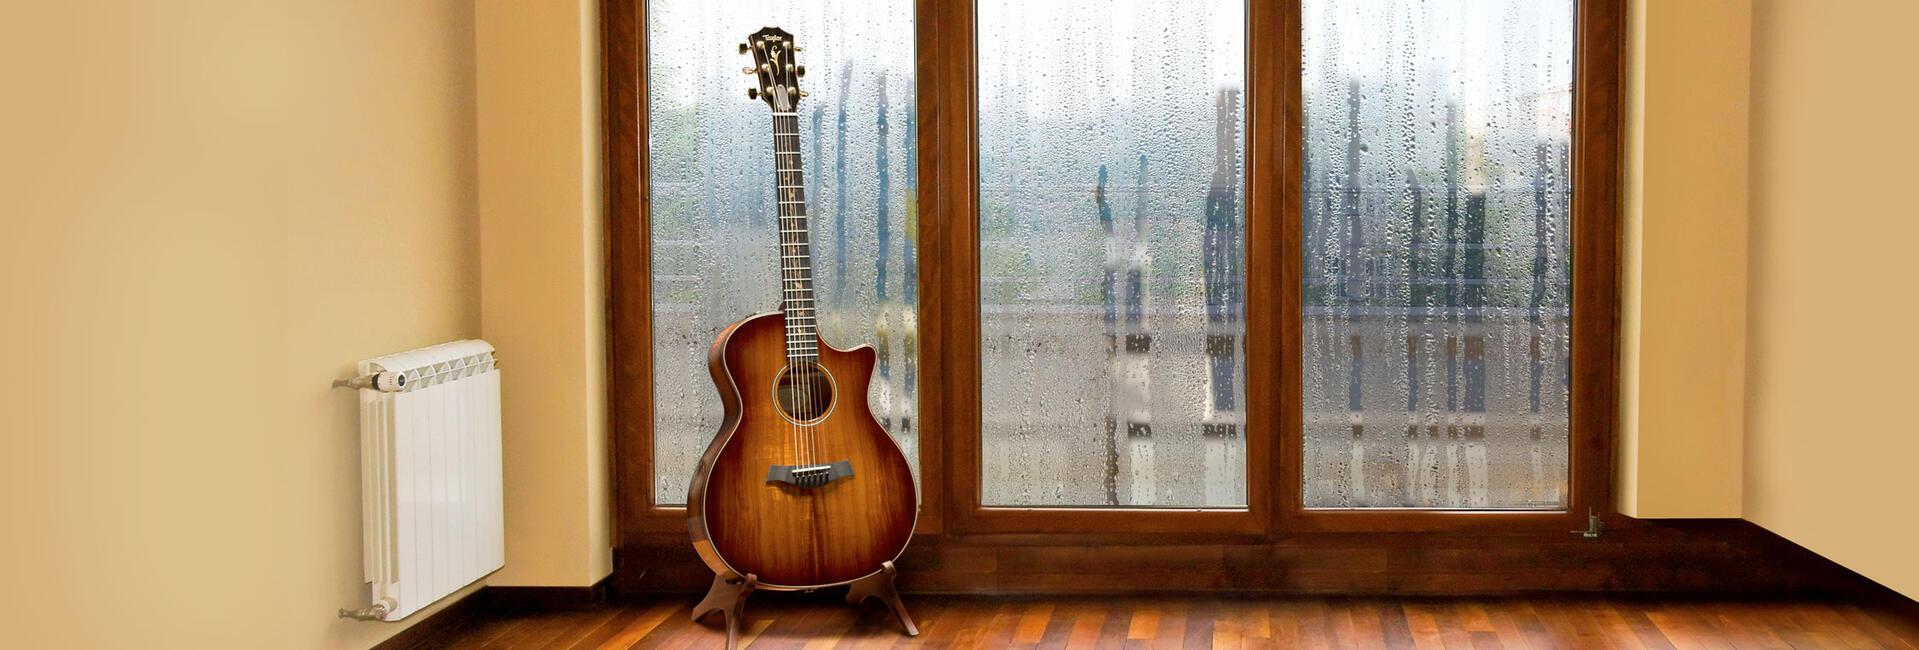 Guitar Health Monitoring System | Taylor Guitars